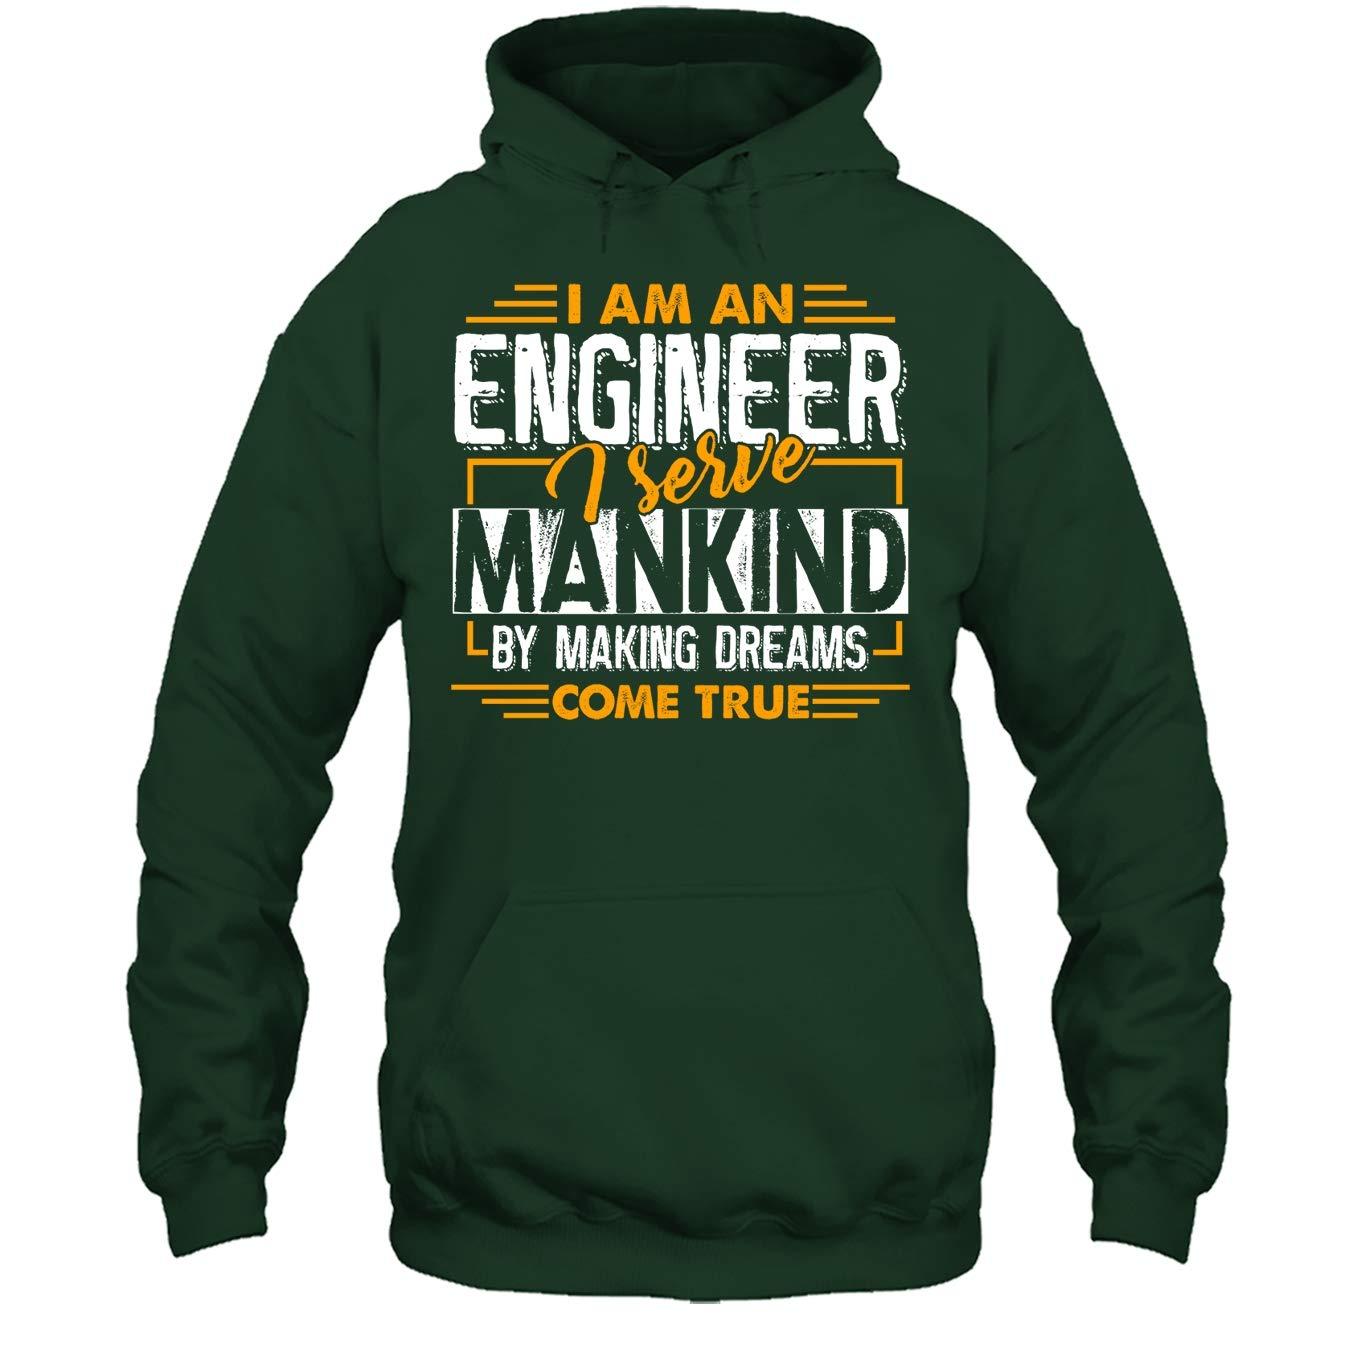 Engineers Serve Mankind Tee Shirt Engineer T Shirt